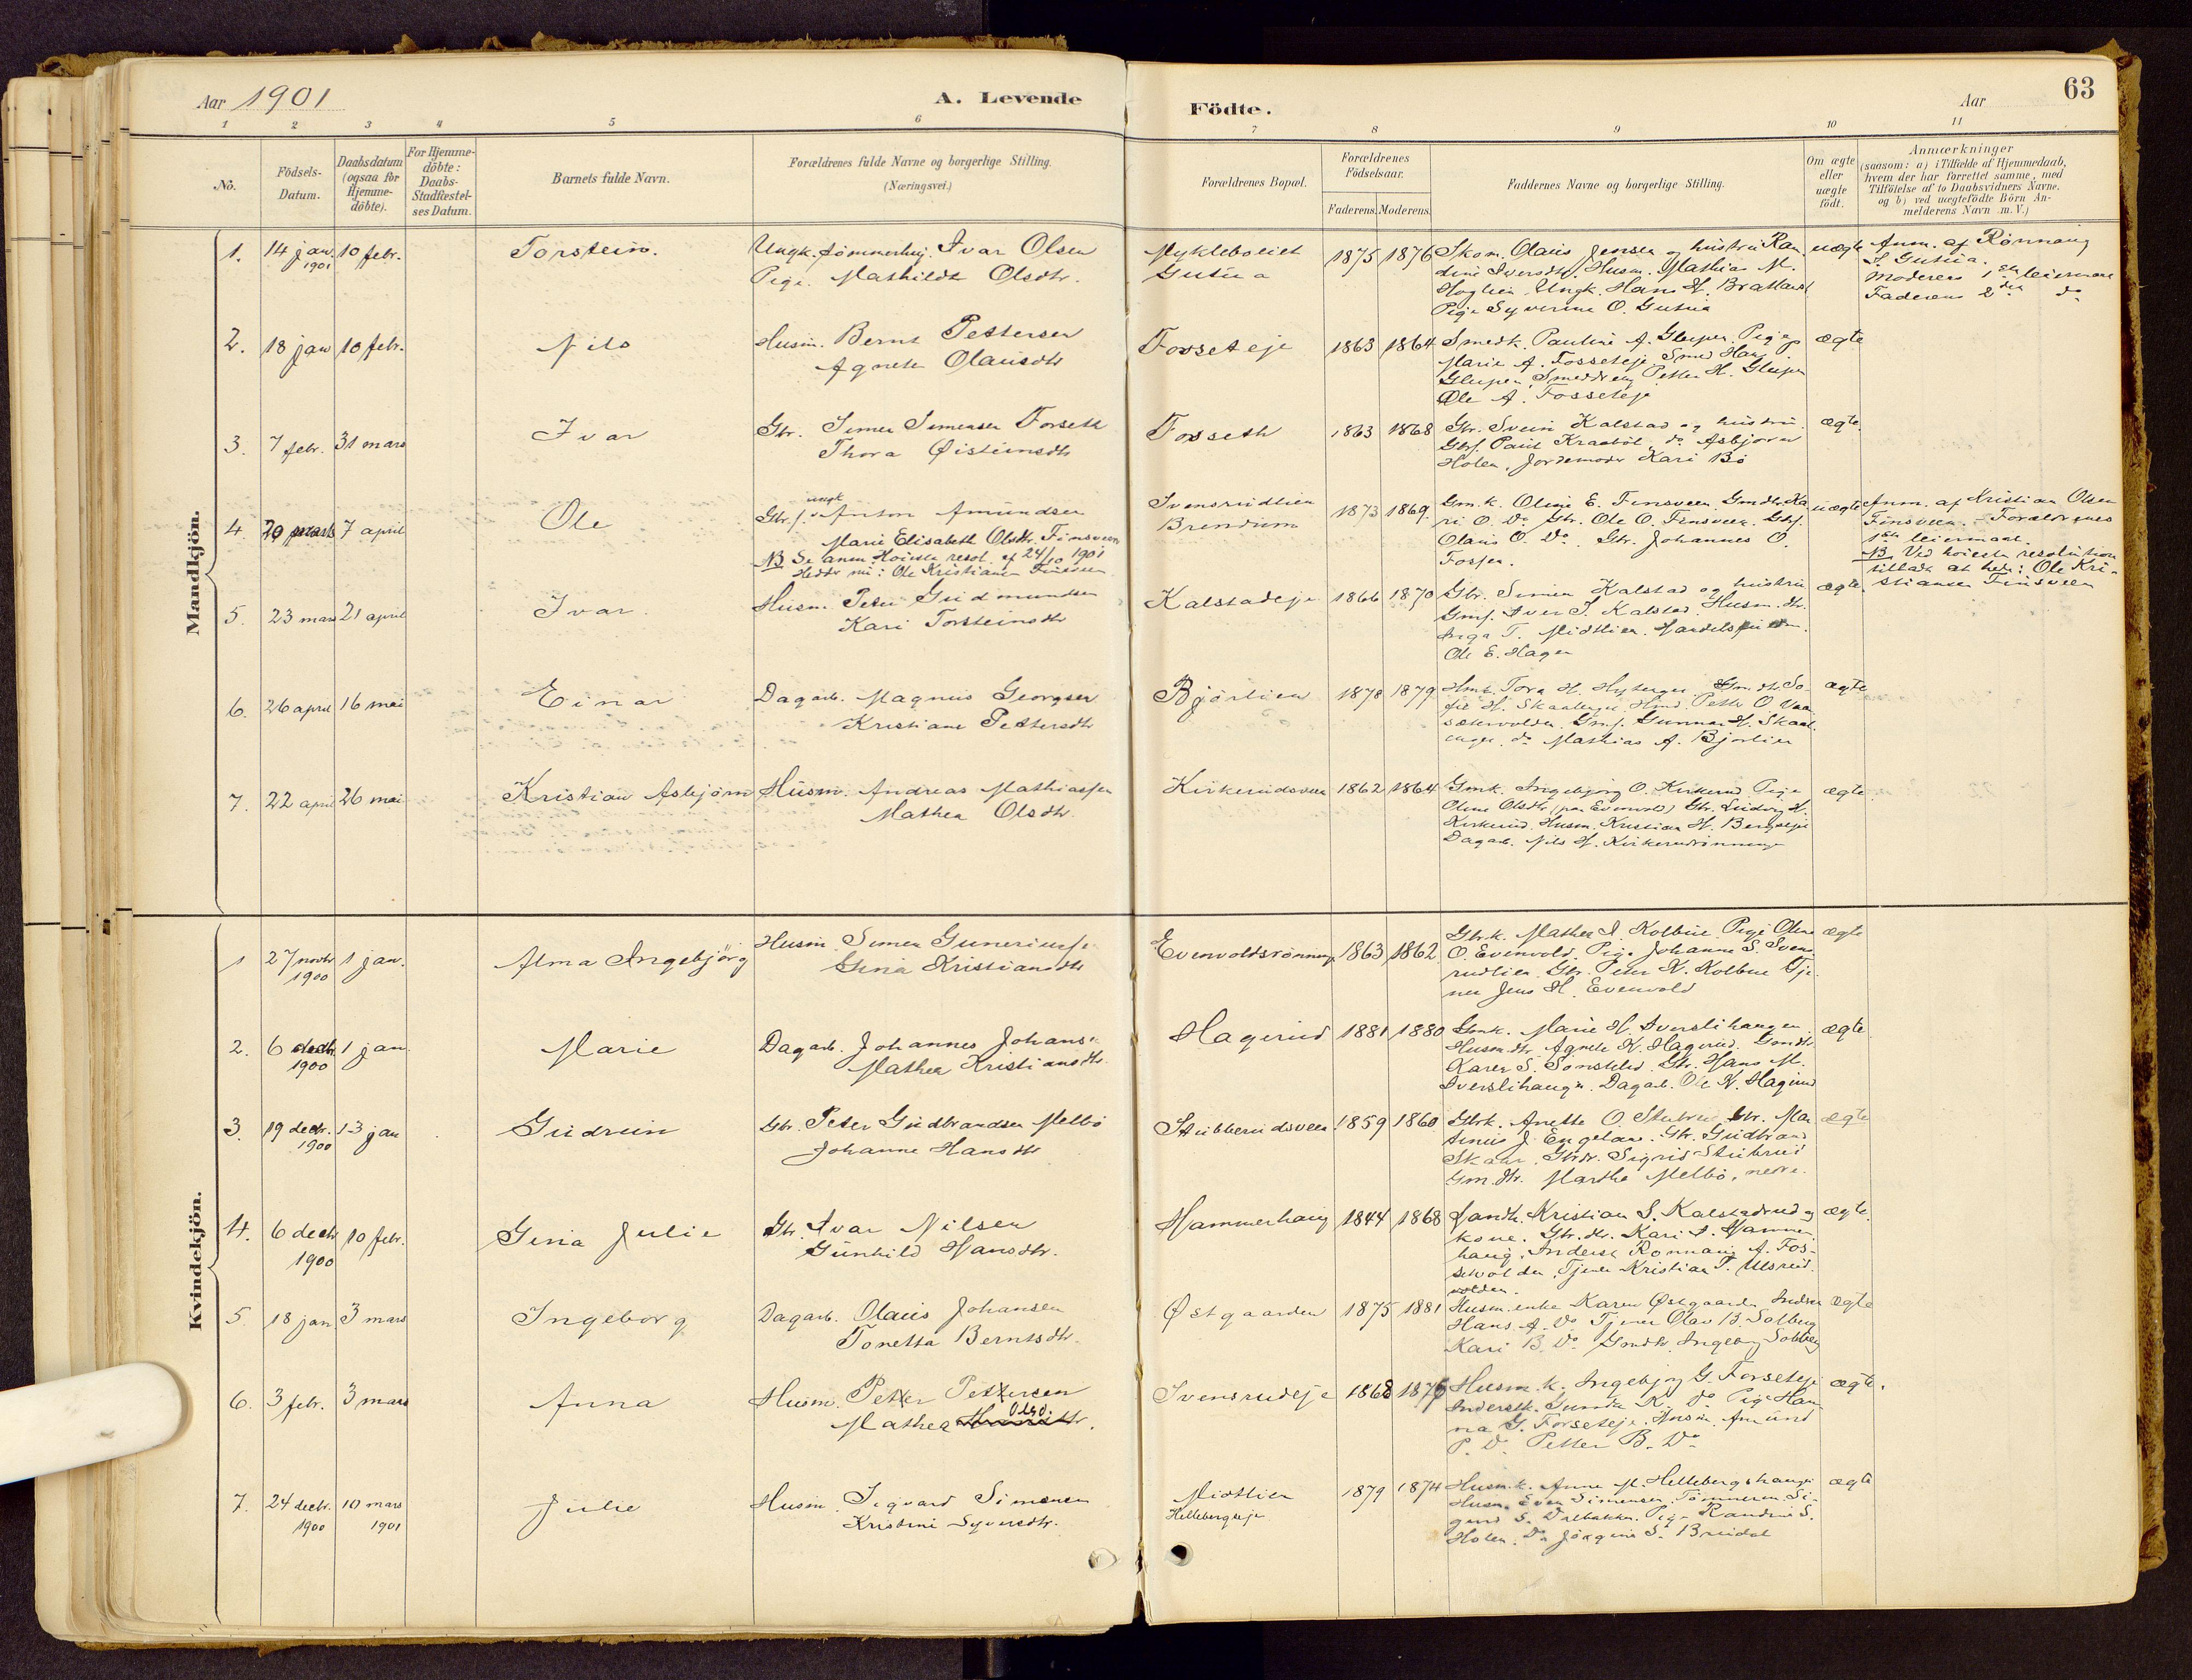 SAH, Vestre Gausdal prestekontor, Ministerialbok nr. 1, 1887-1914, s. 63